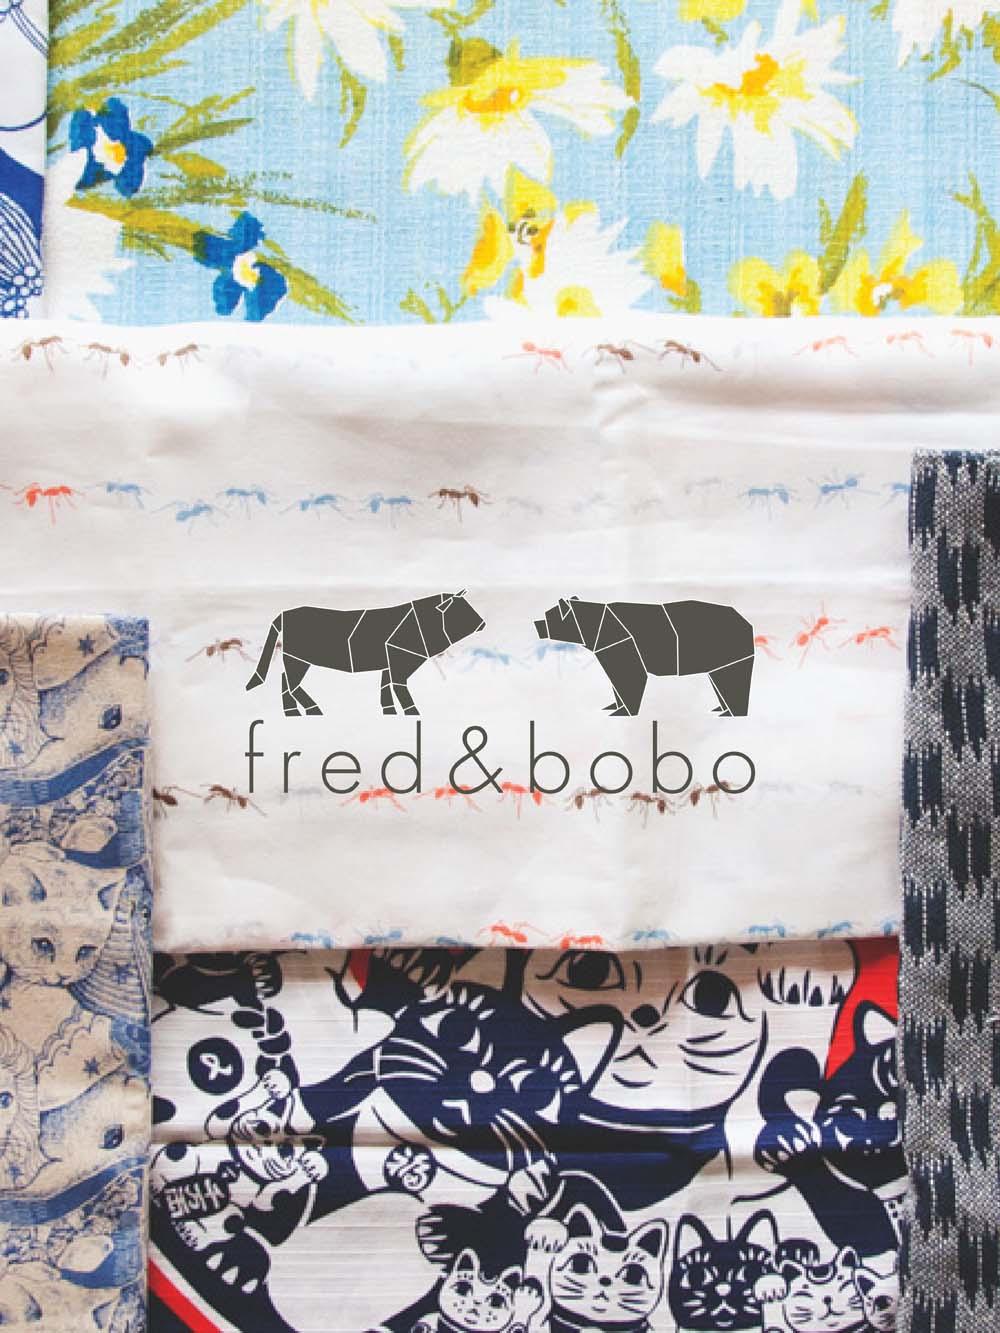 Fred & Bobo